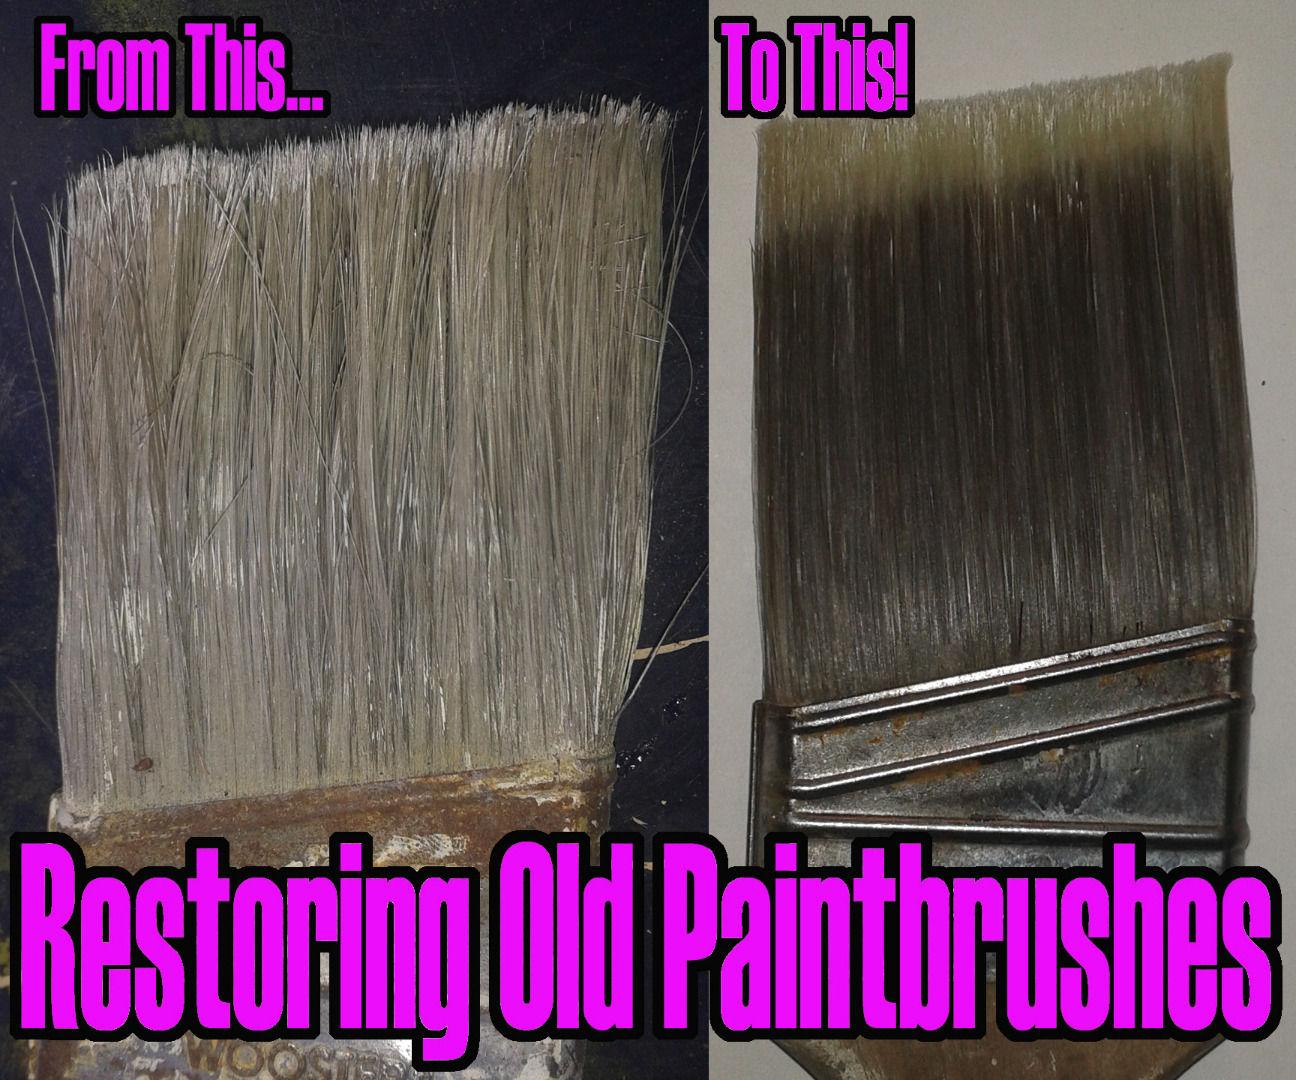 Restoring Old Paintbrushes